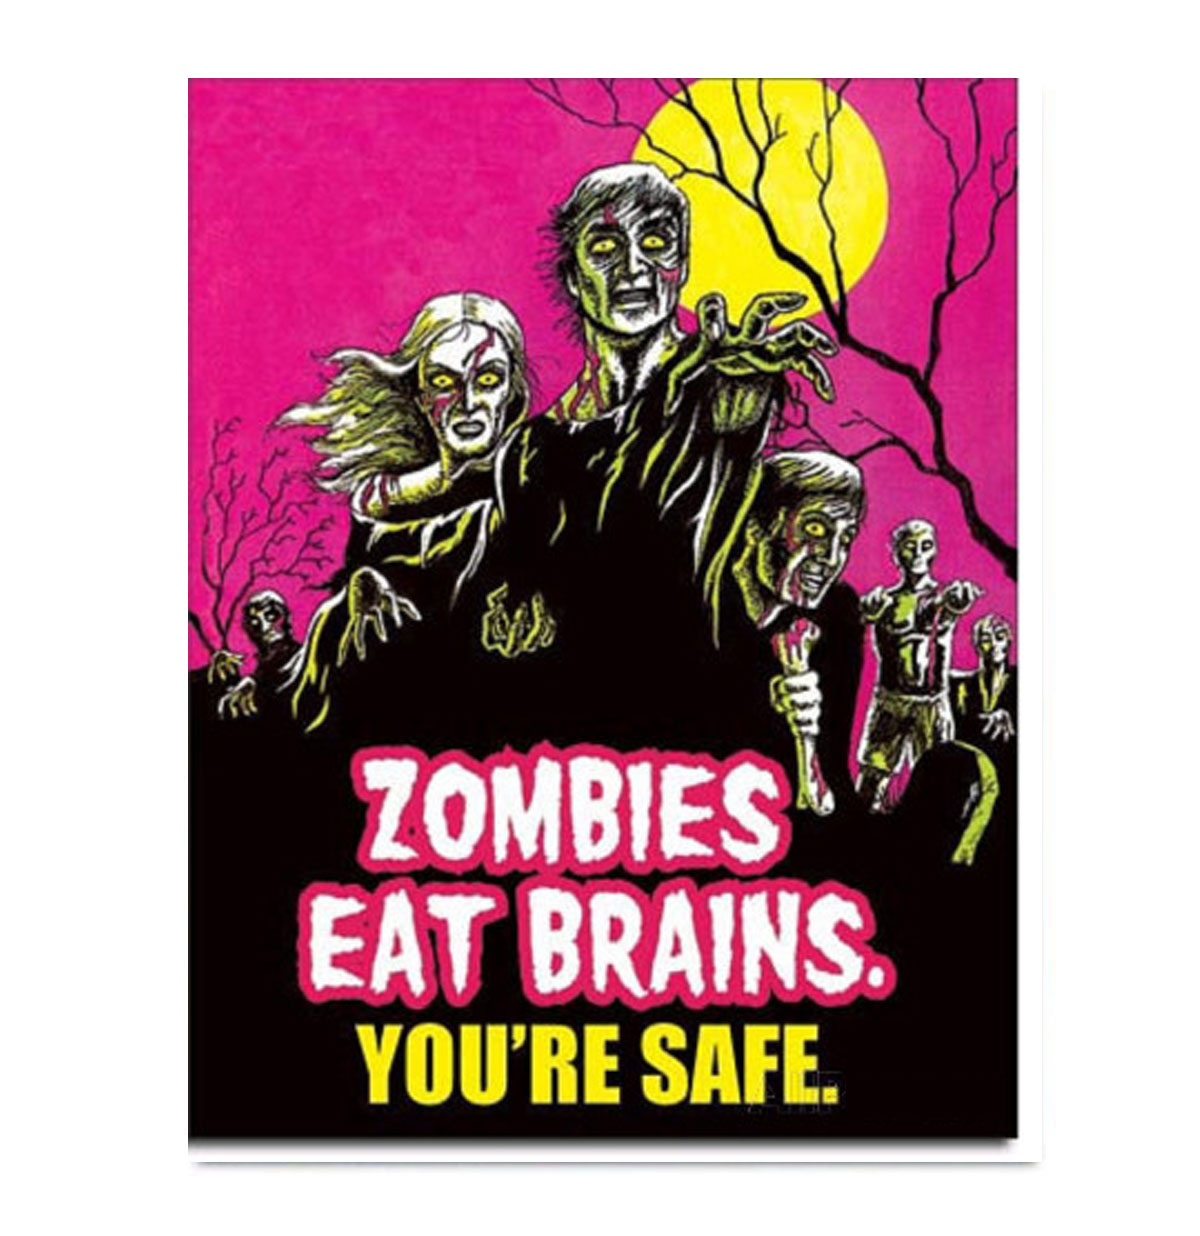 Metal Poster Zombies Eat Brains